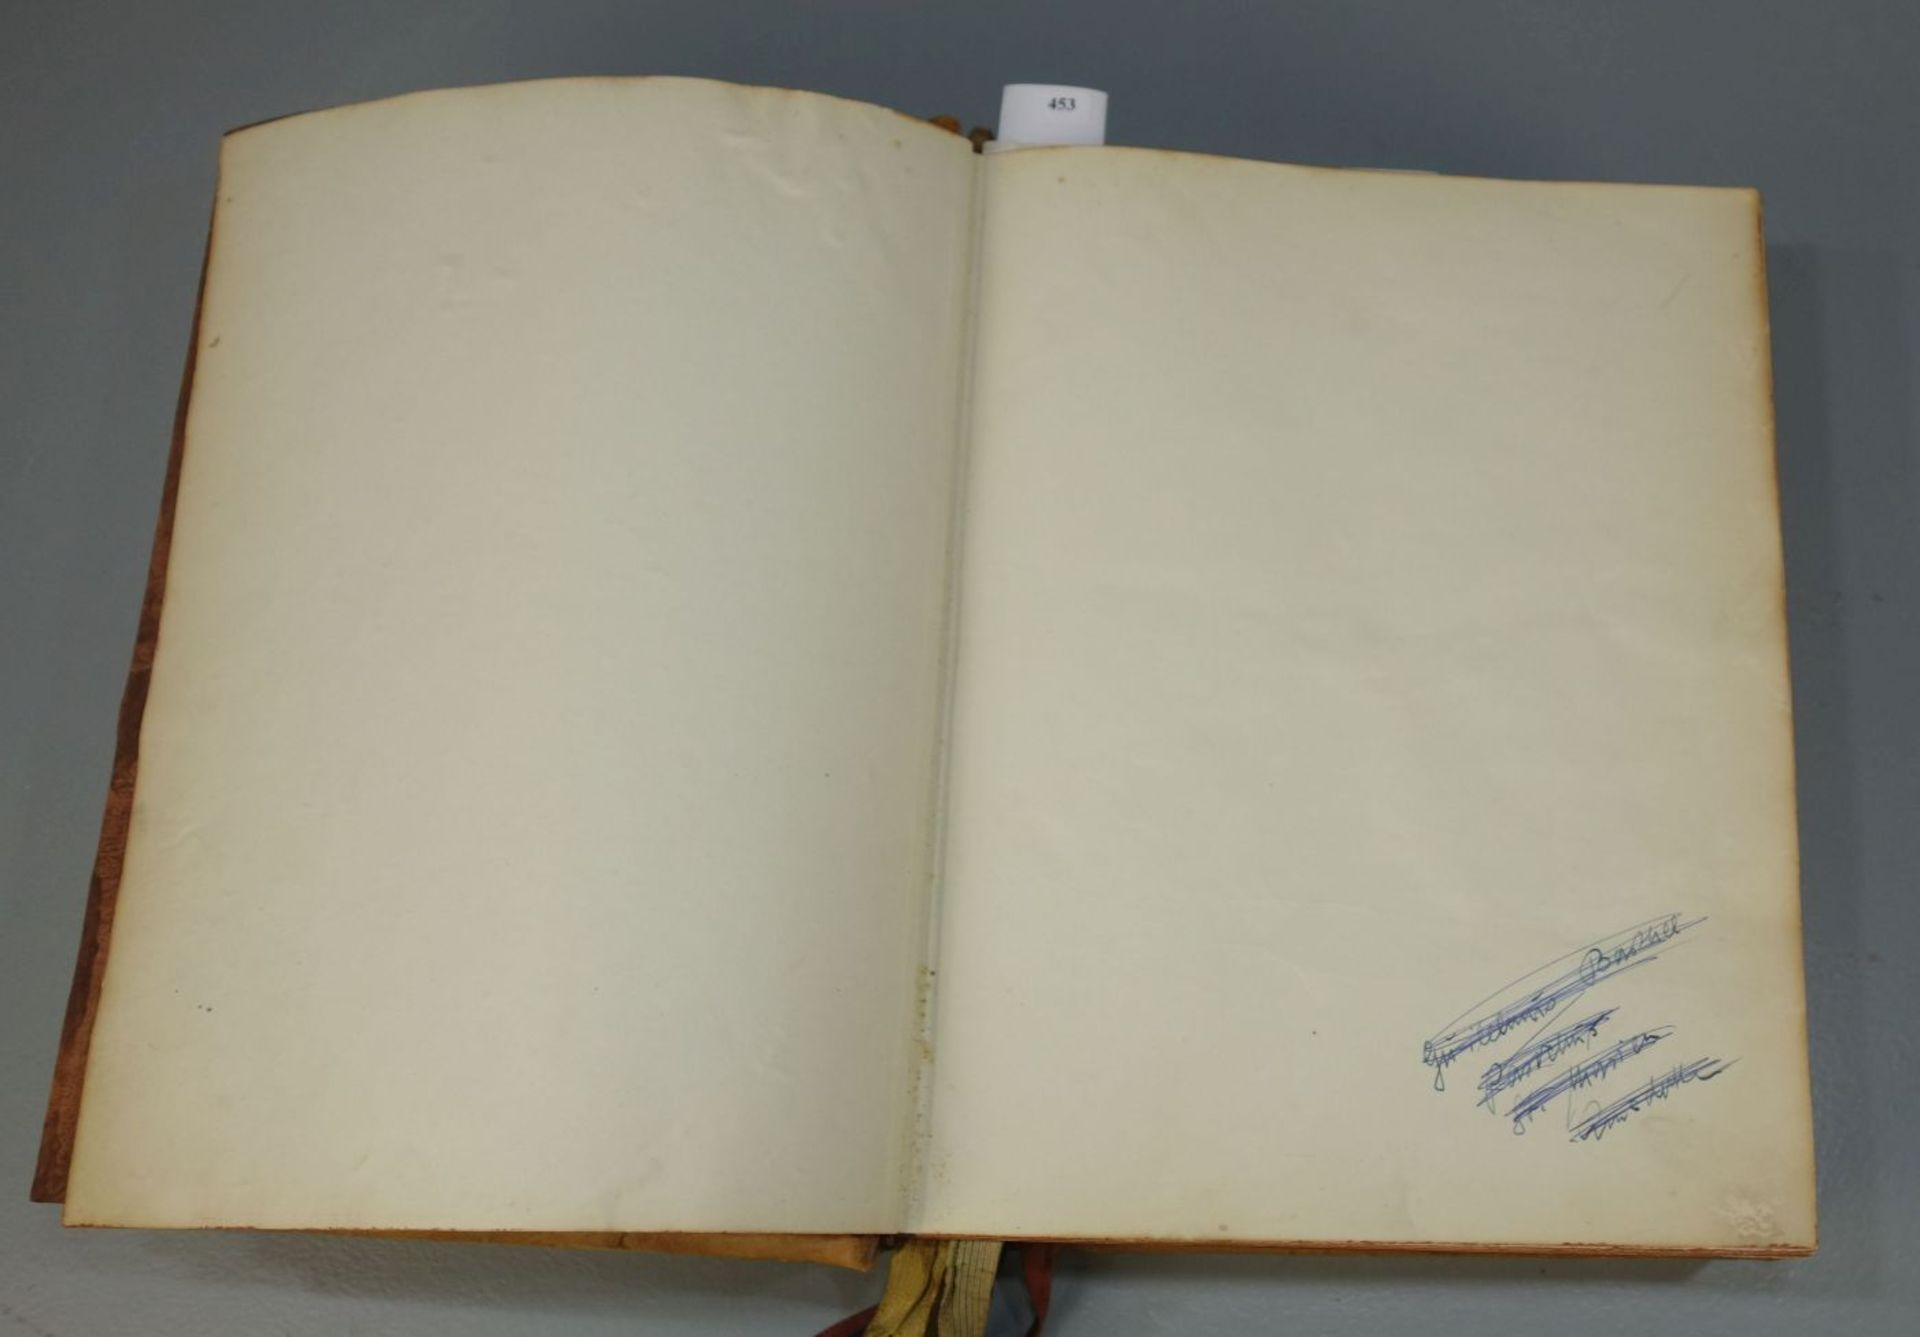 BIBEL IM LEDEREINBAND - Bild 4 aus 8